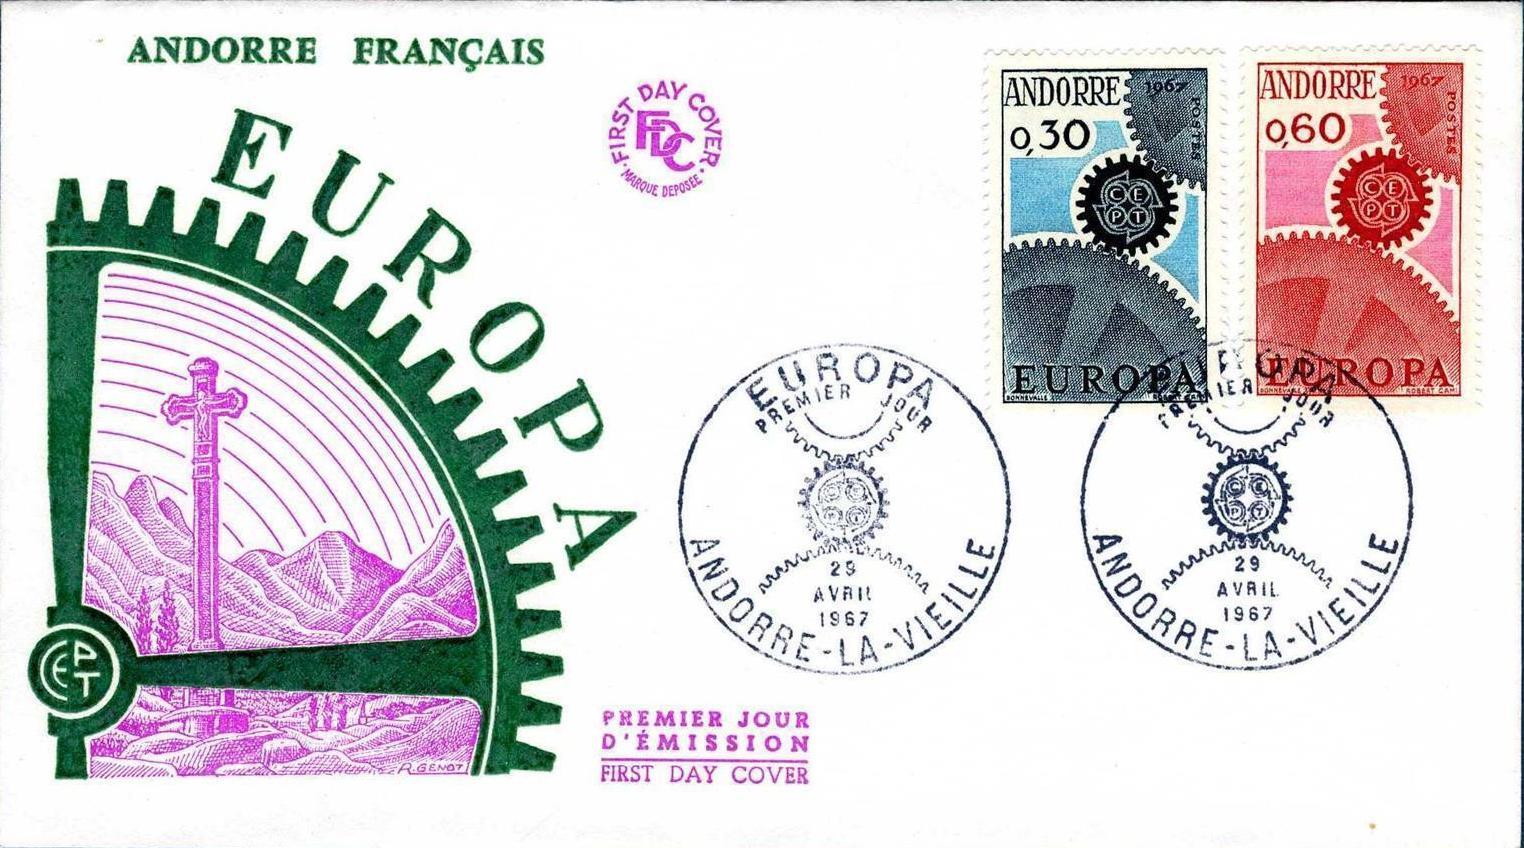 Andorra-French 1967 Europa FDCa.jpg